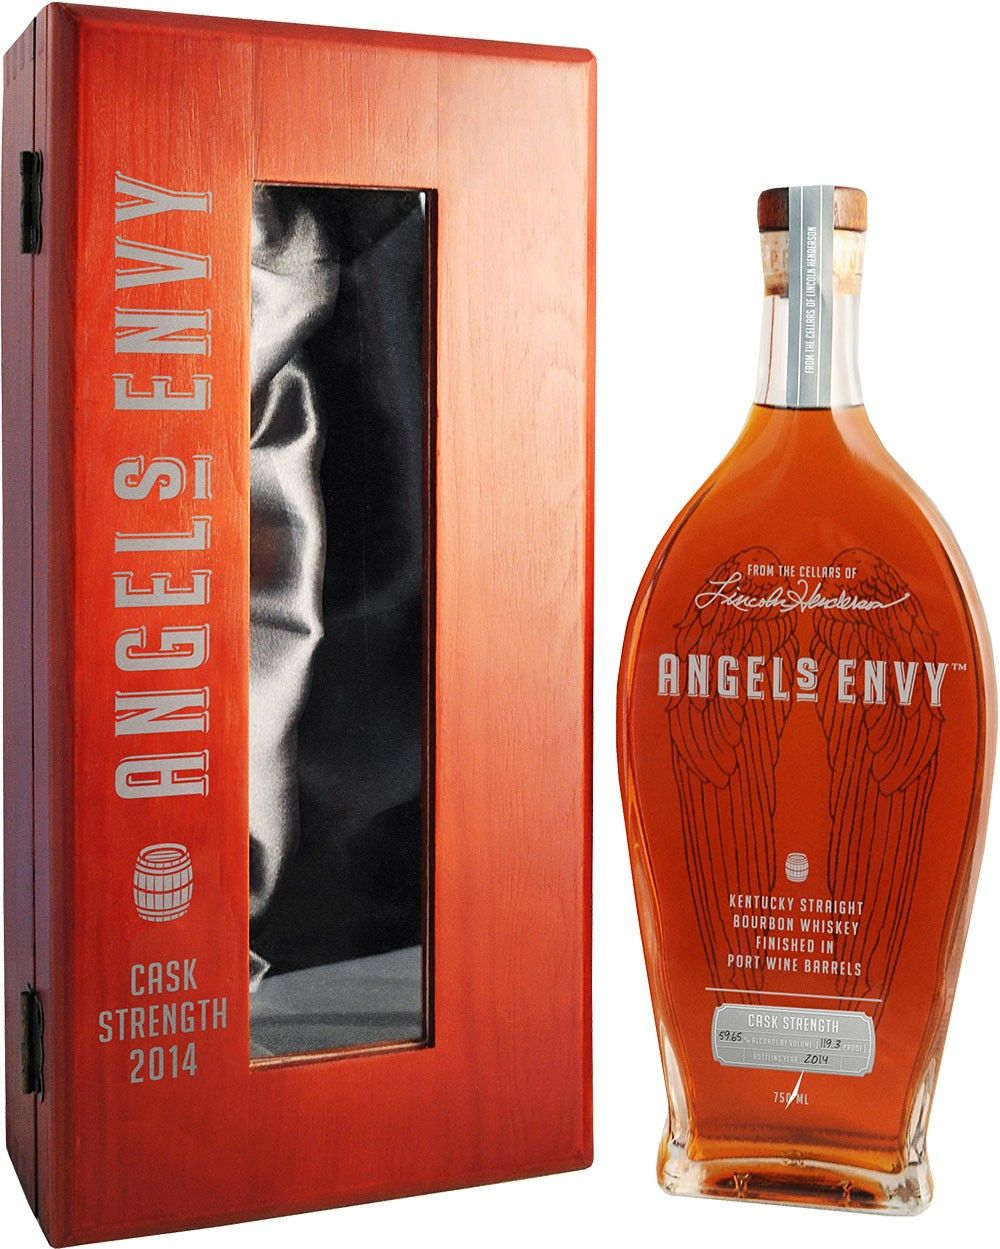 Caskers Selection Angel S Envy Cask Strength Bourbon Cigars And Whiskey Bourbon Cask